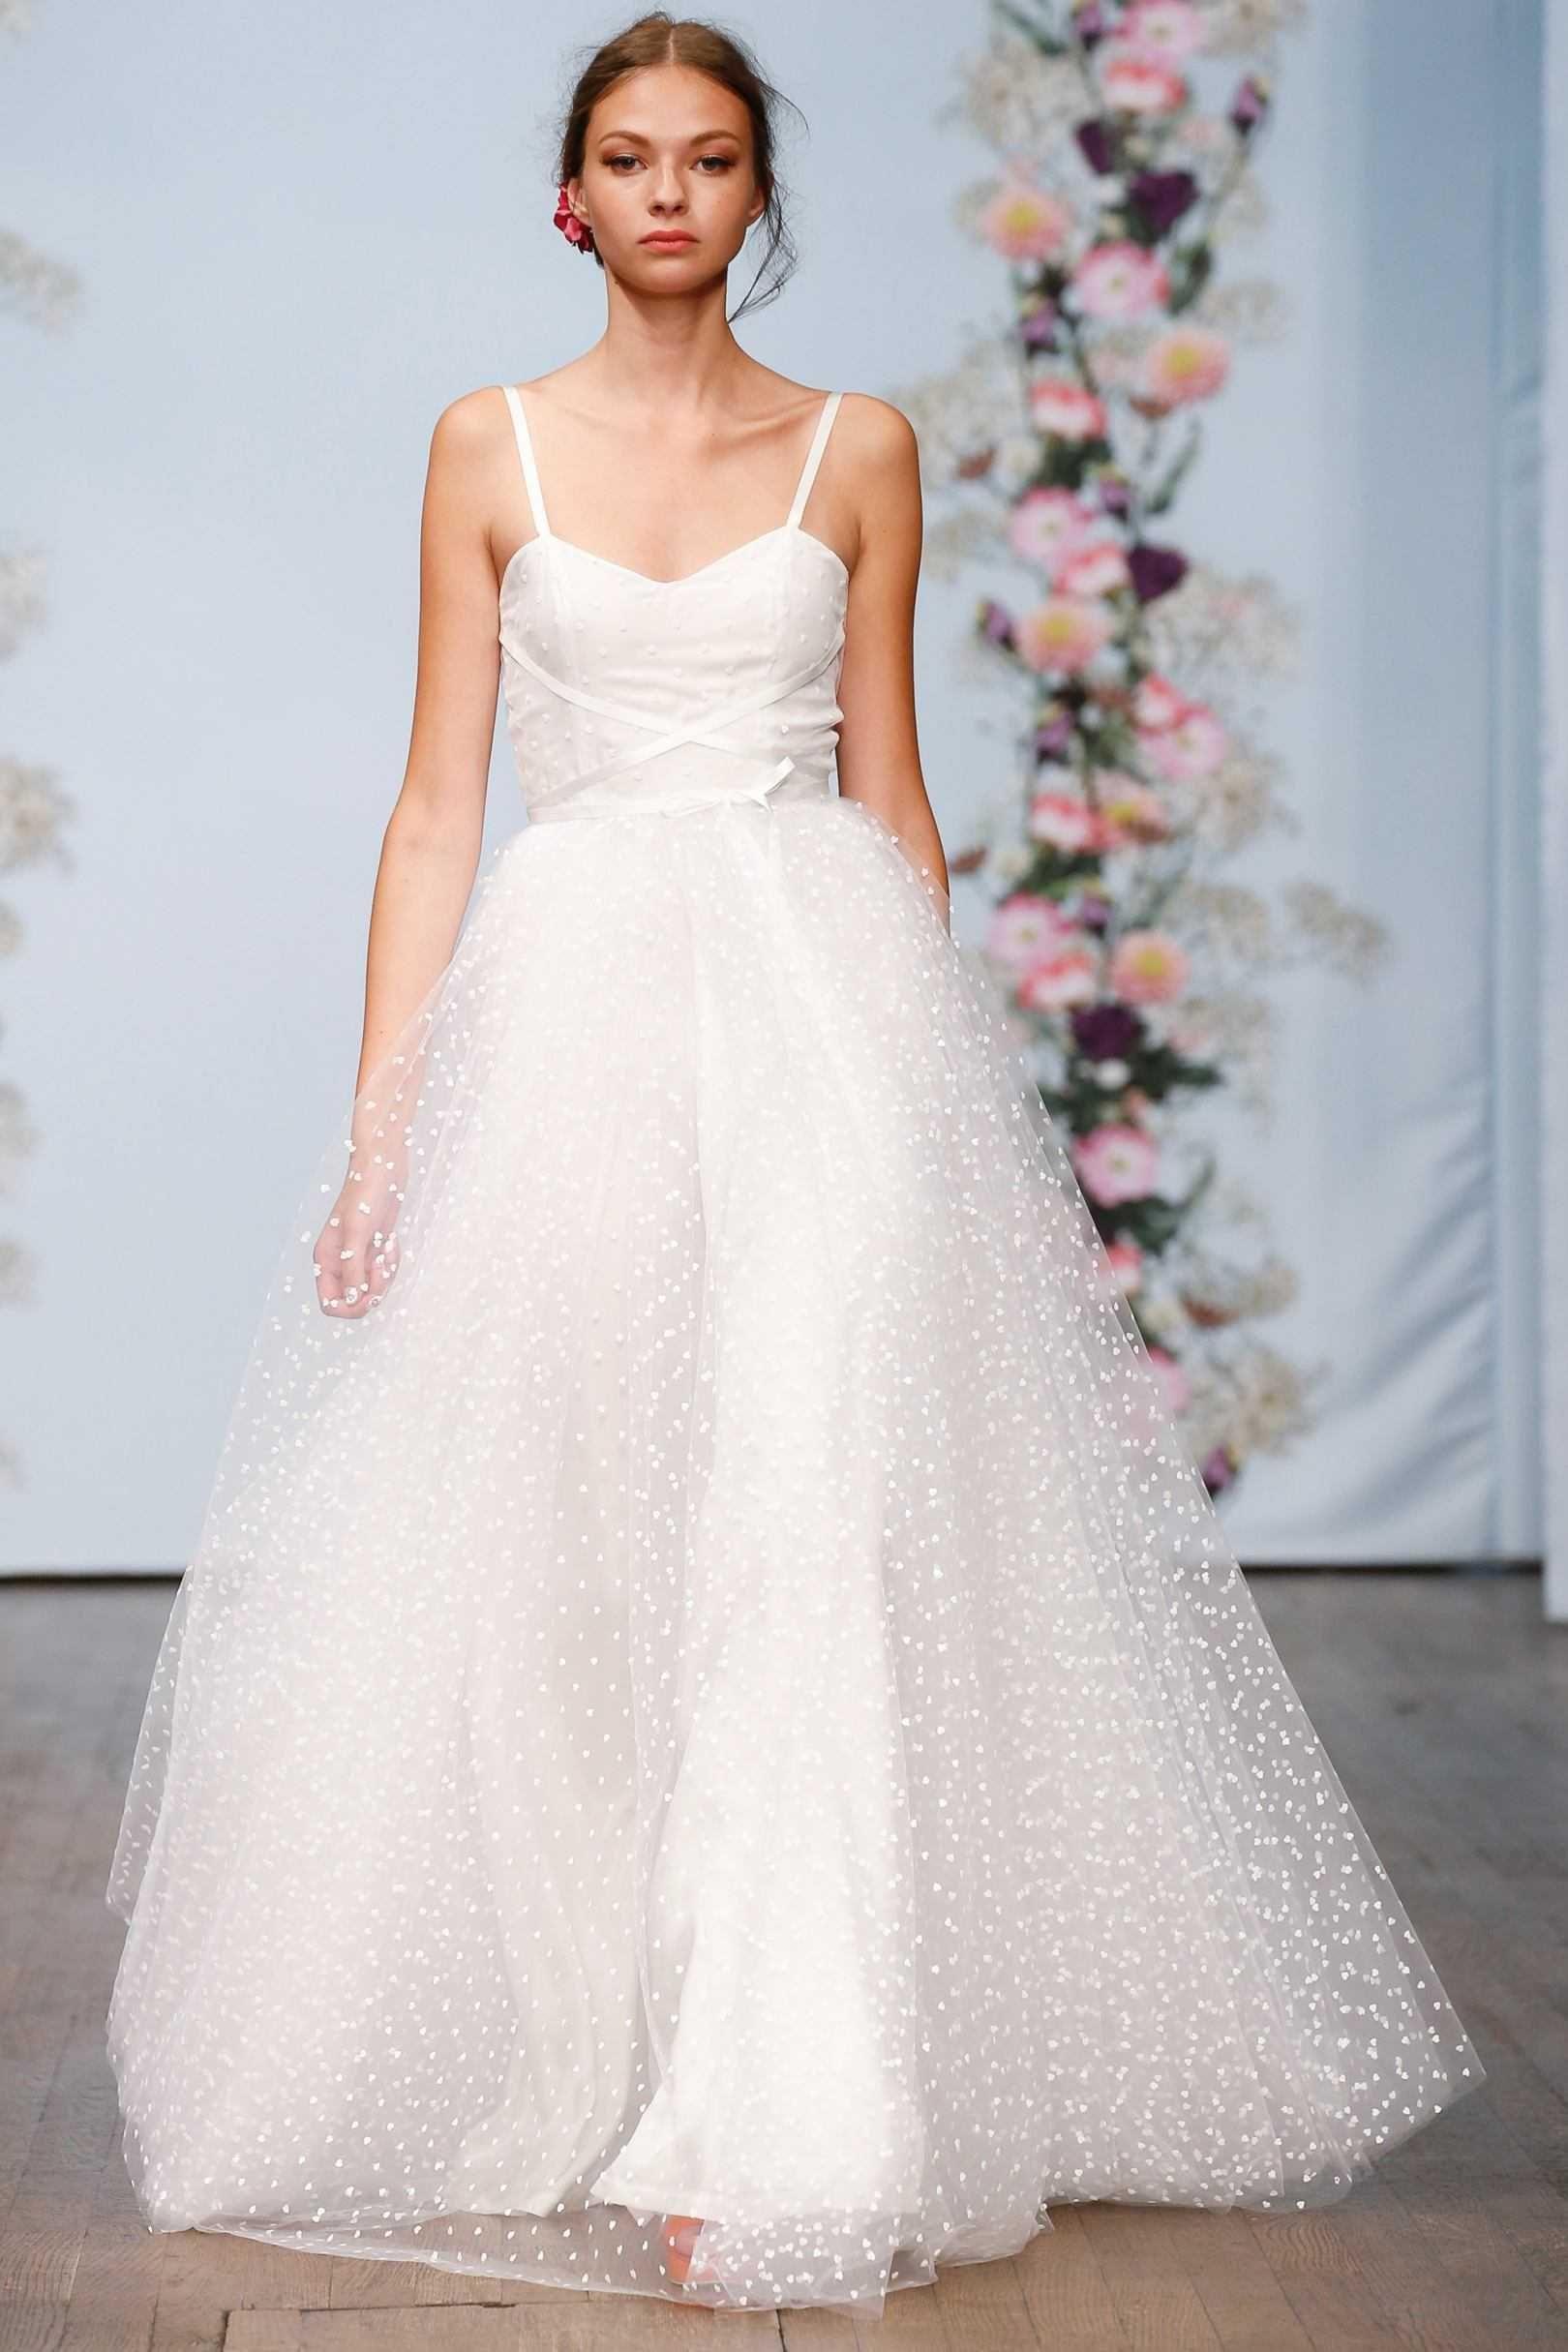 Image Is Loading Jcrew Carenna Column Sheath Ivory Swiss Dot Wedding ...